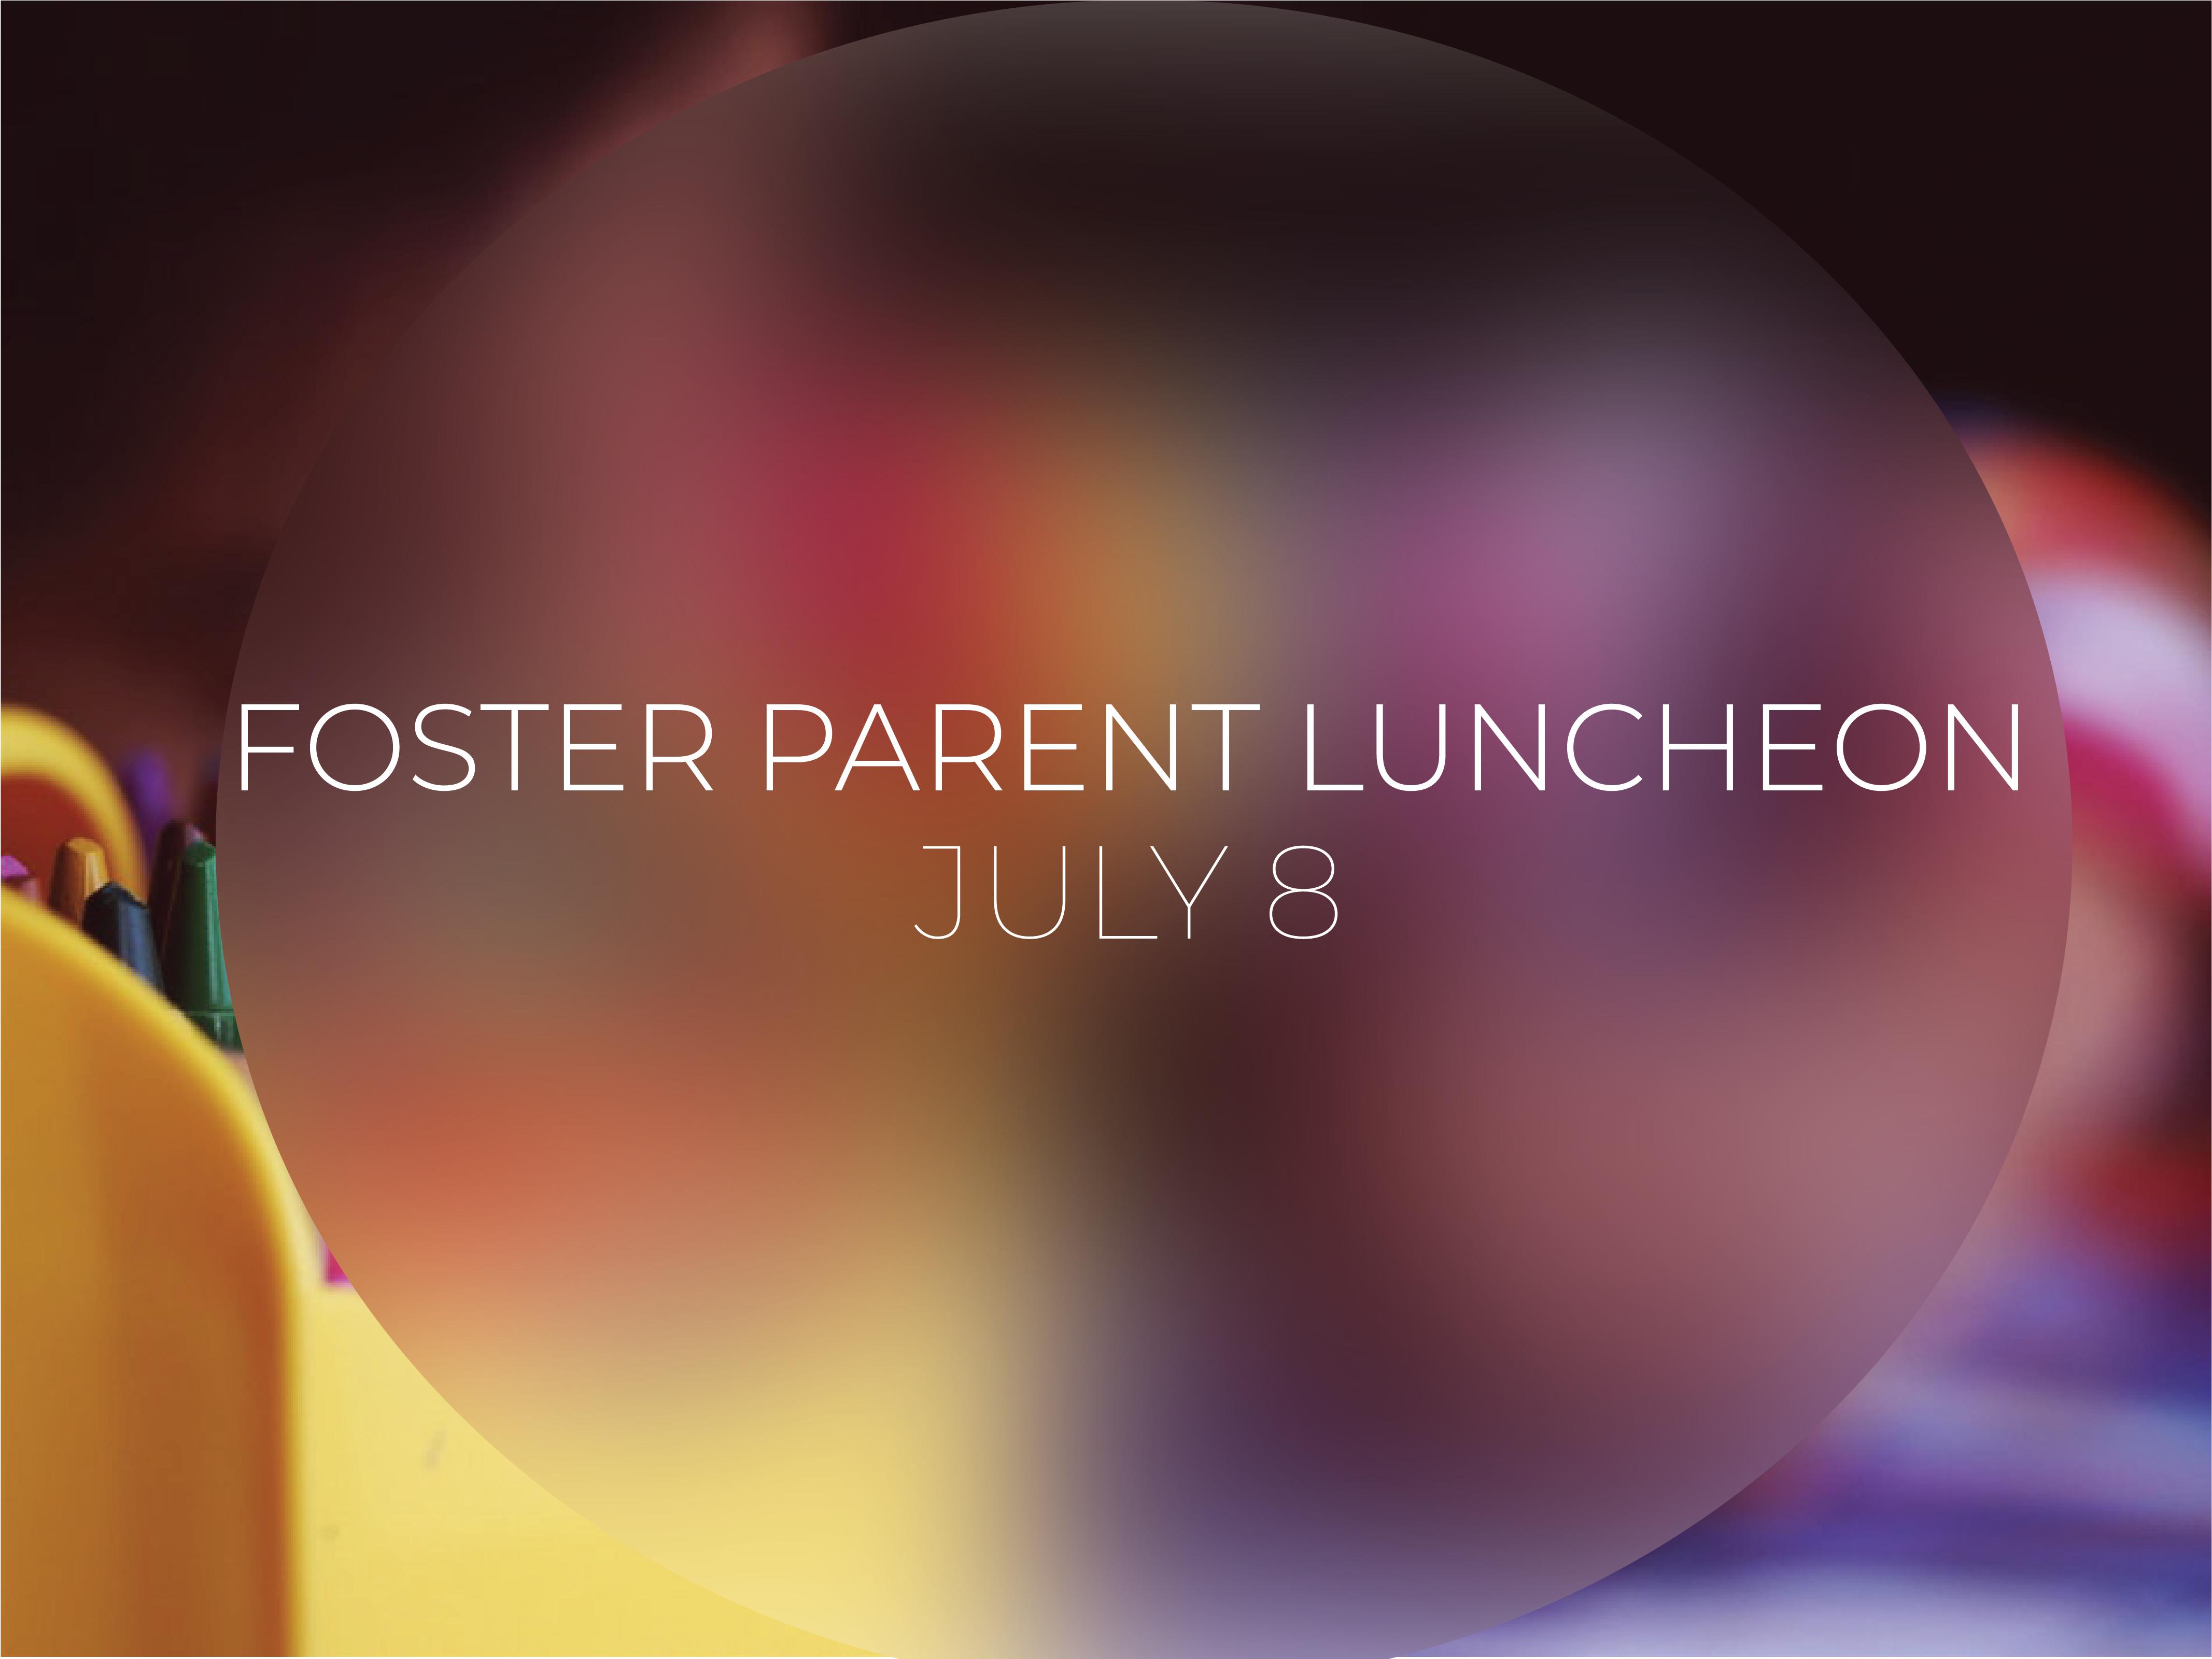 Foster parent luncheon pco registration